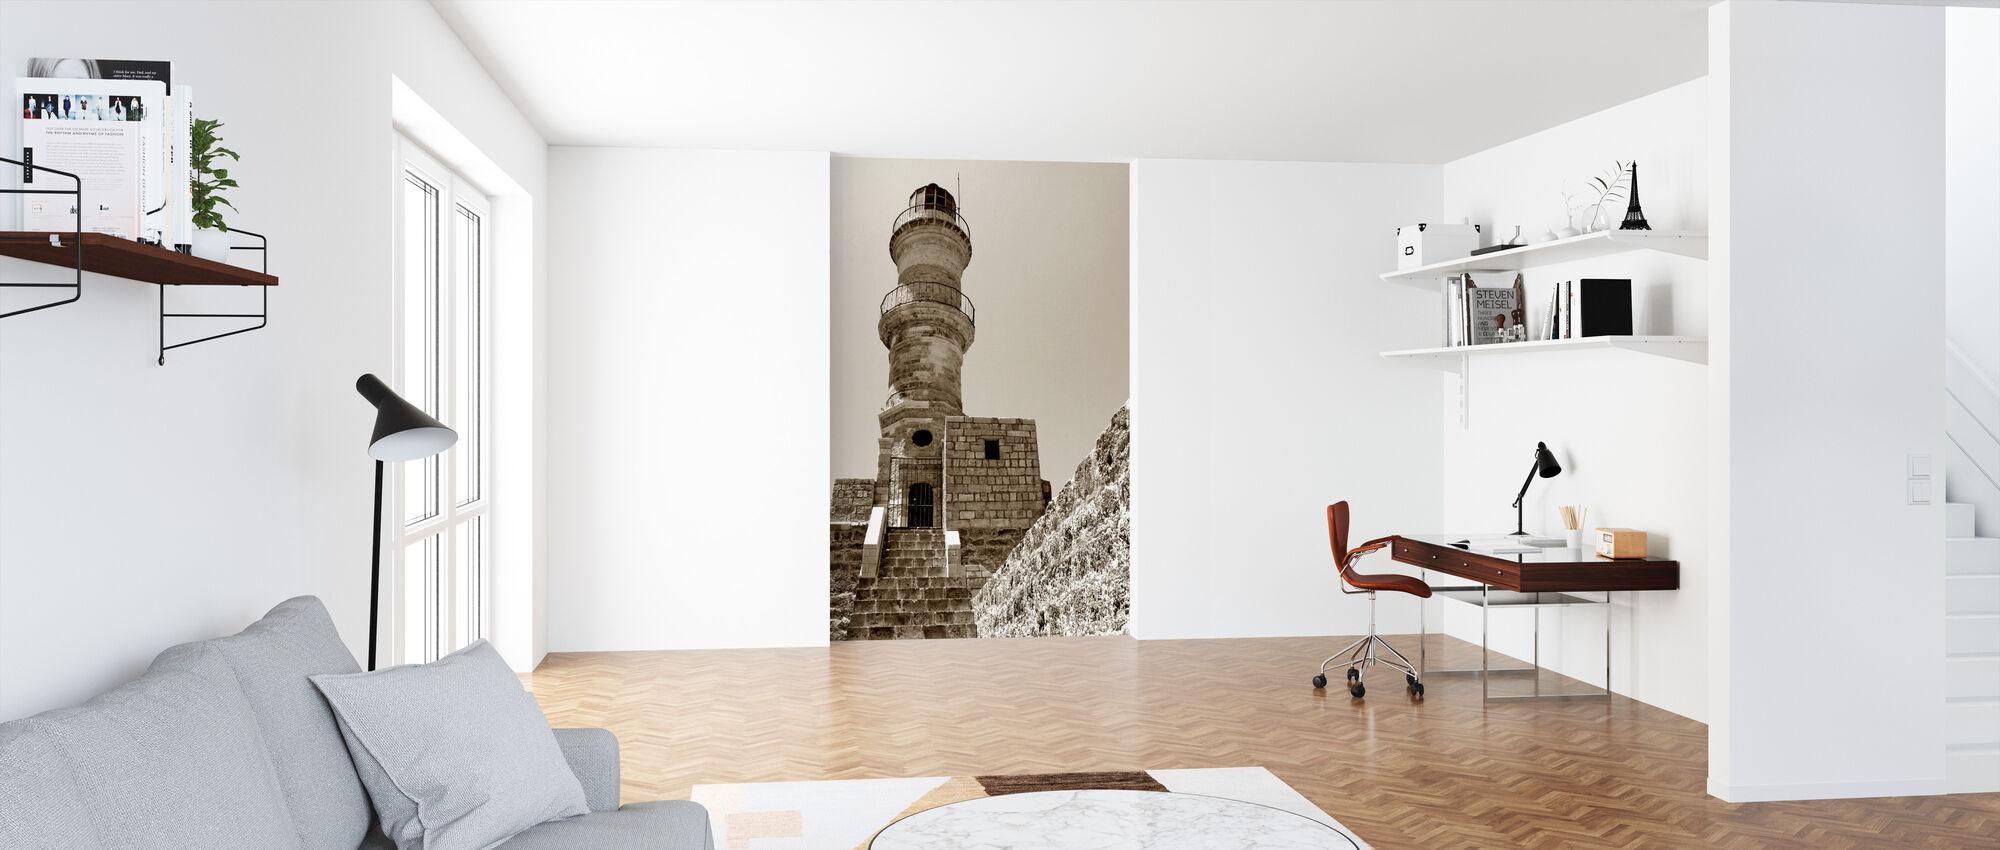 Lighthouse - Wallpaper - Office